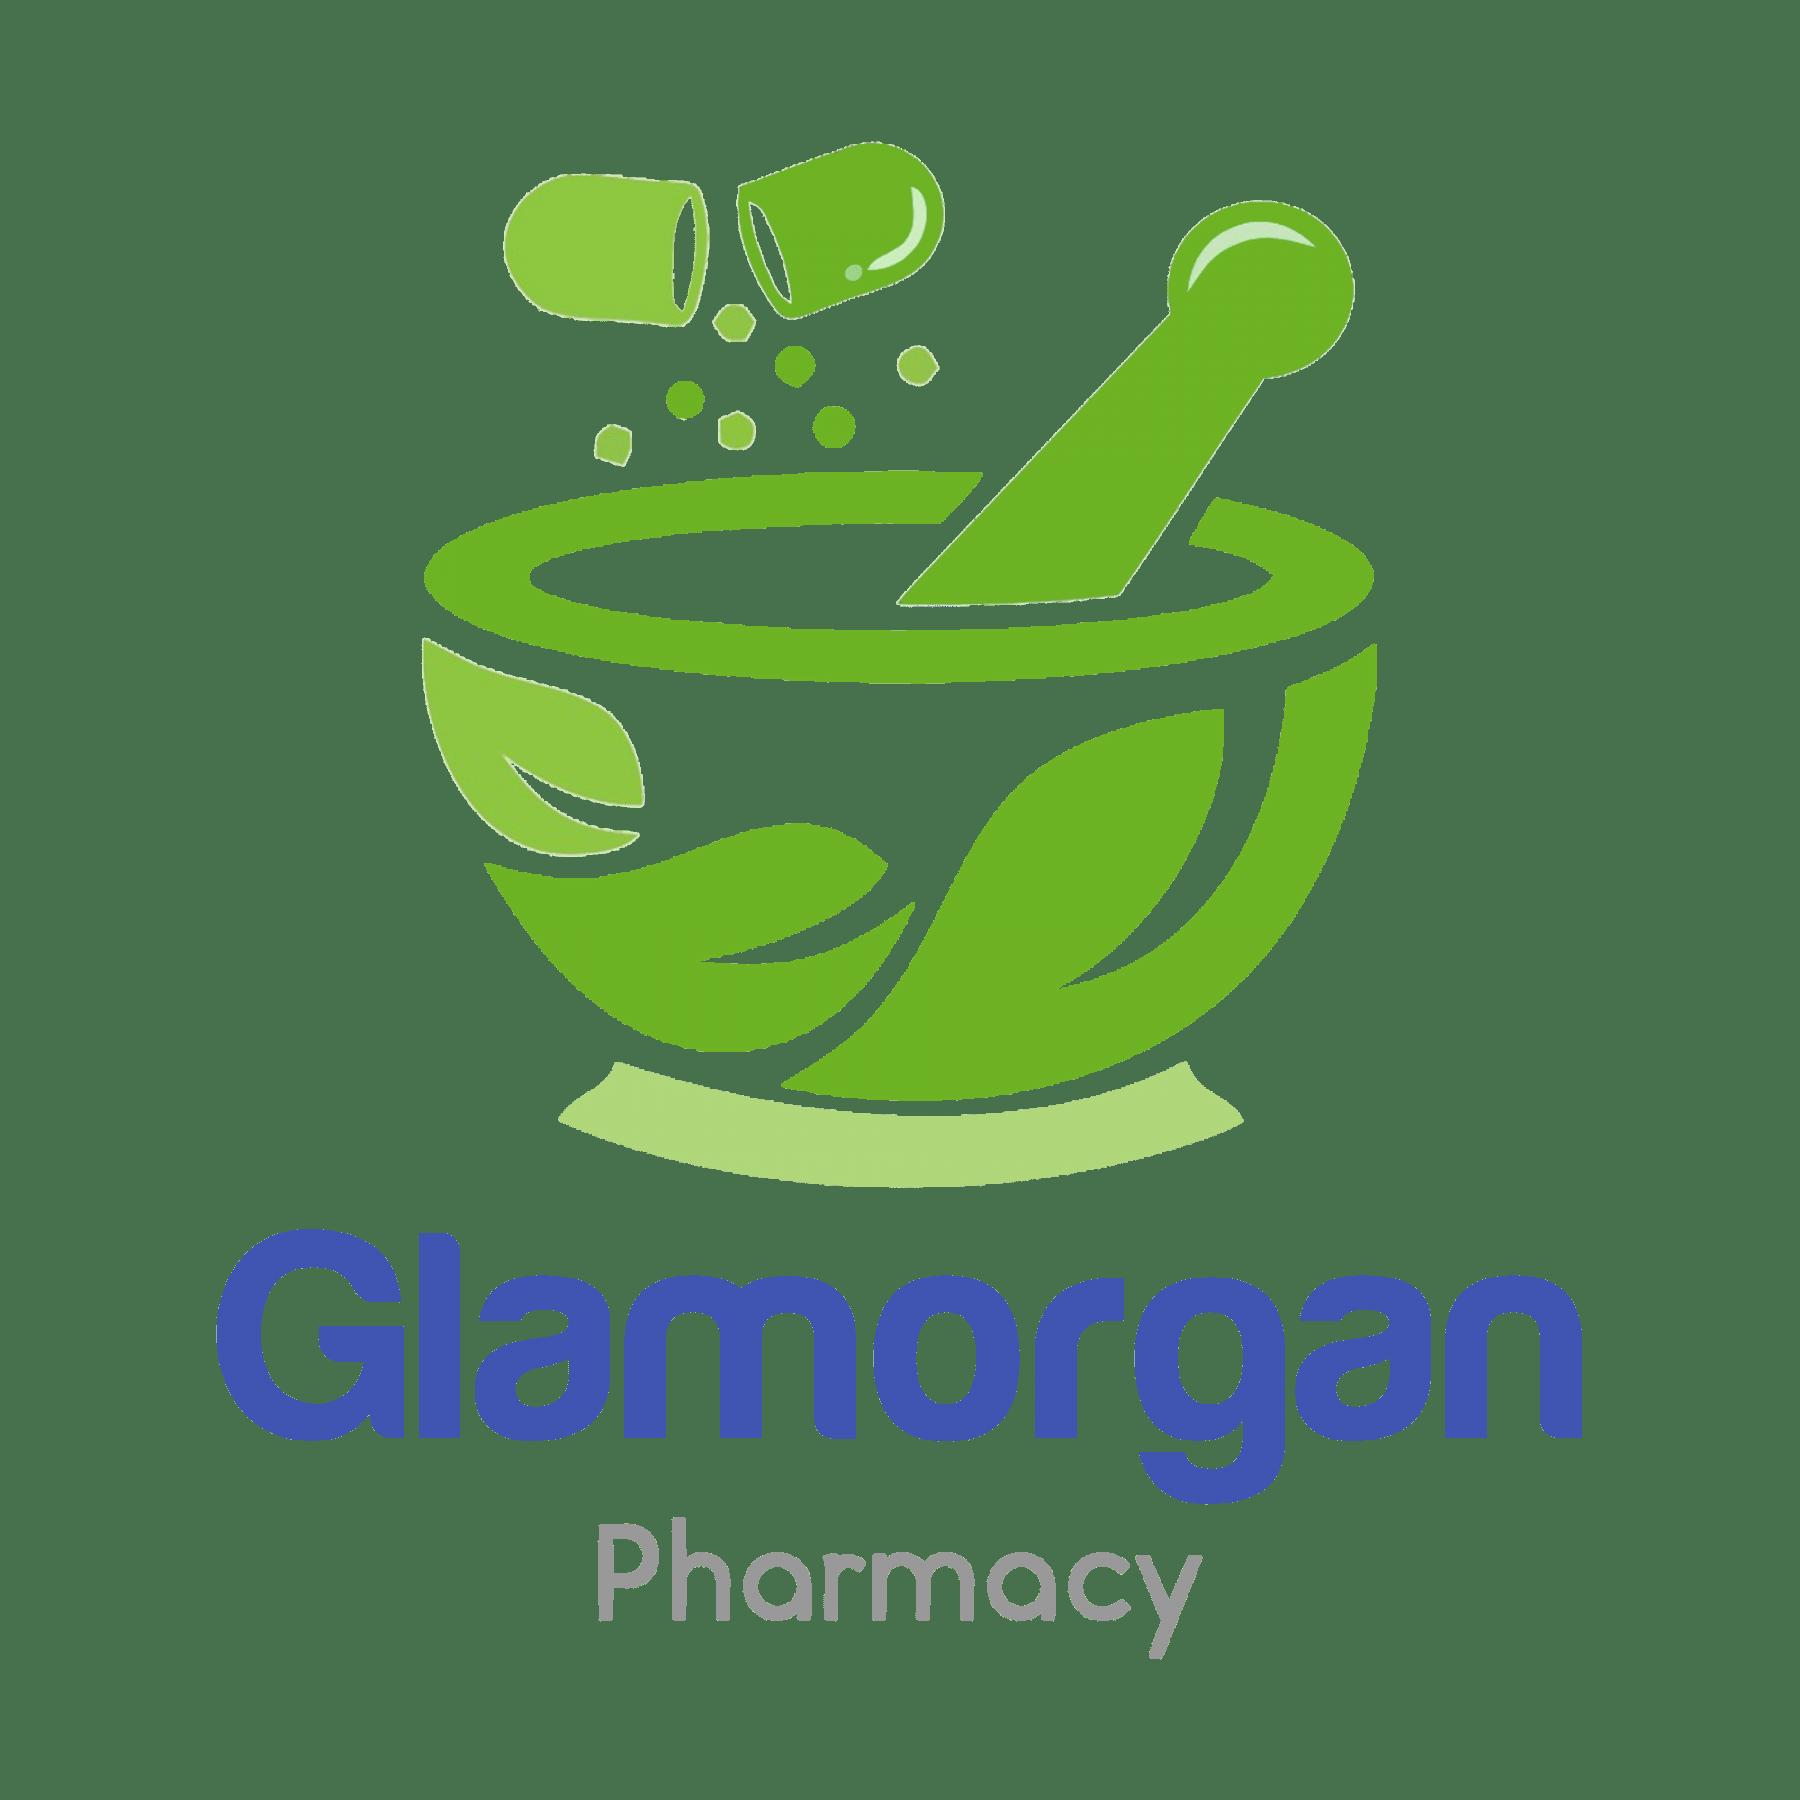 Glamorgan Pharmacy